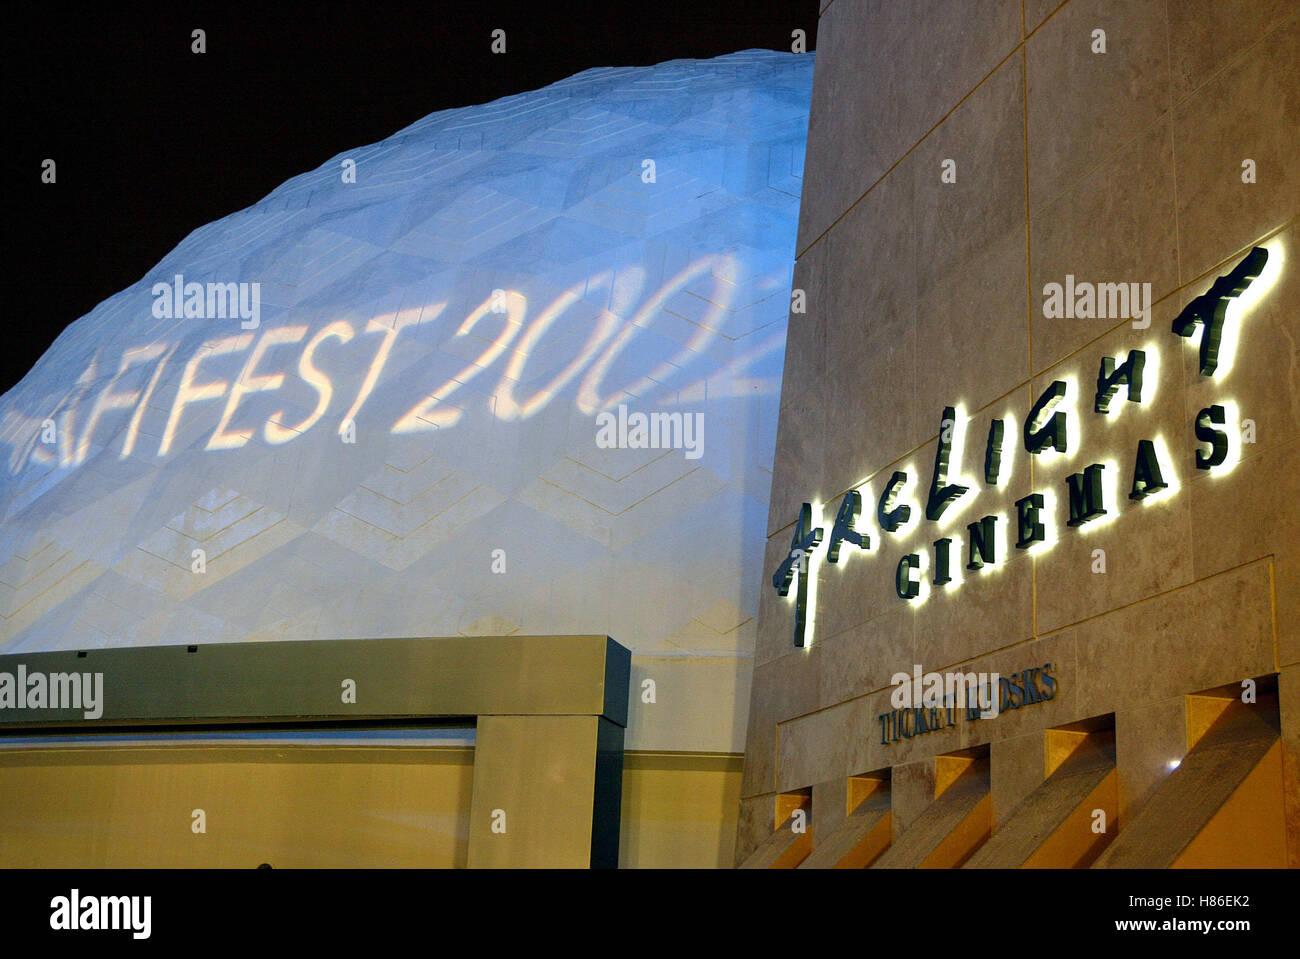 ARCLIGHT CINEMA CINERAMA DOME SNAKESKIN PREM AFI FESTIVAL ARCLIGHT HOLLYWOOD LA  USA 09 November 2002 - Stock Image